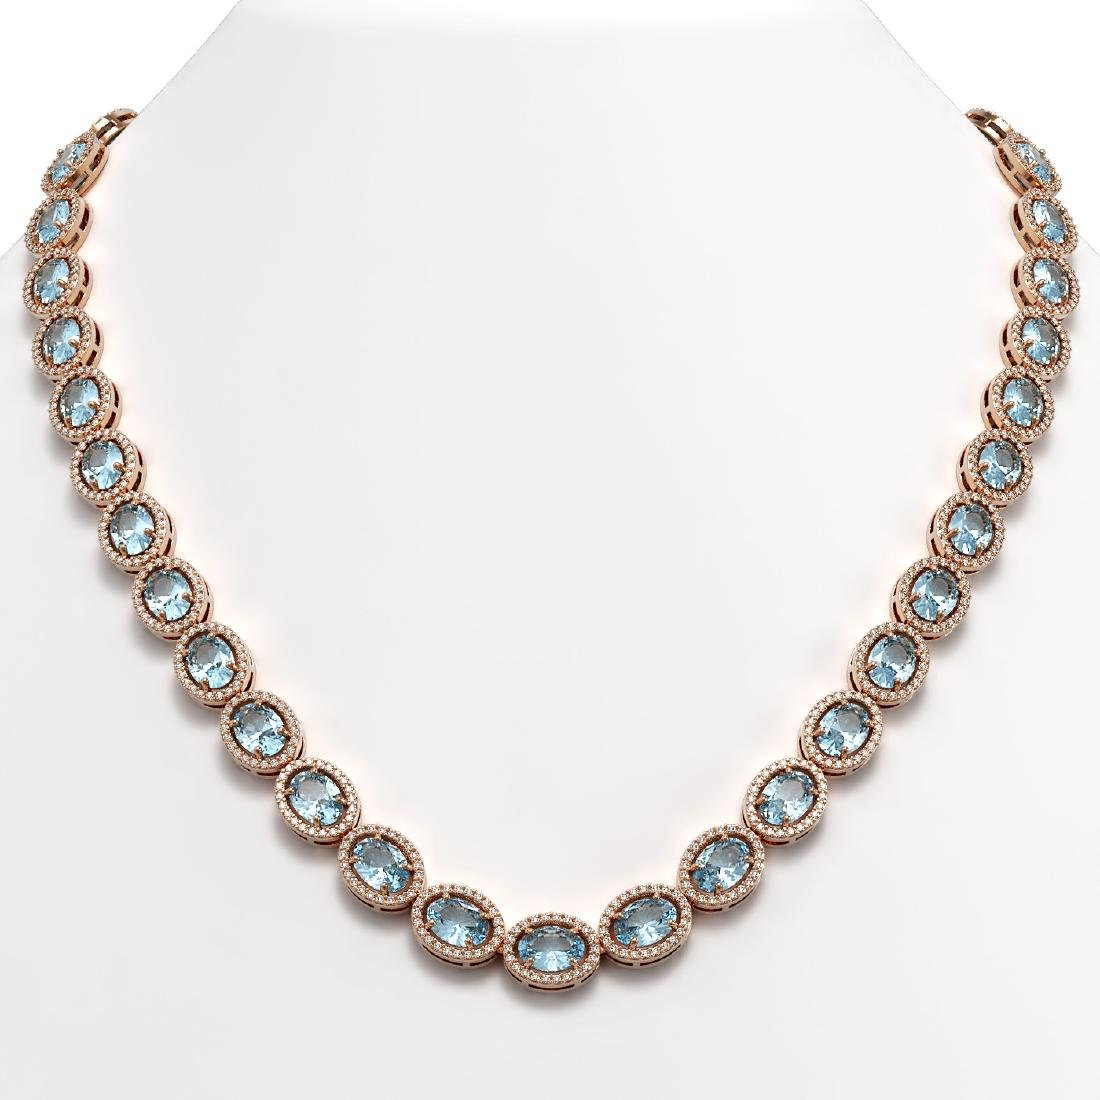 55.41 CTW Sky Topaz & Diamond Halo Necklace 10K Rose